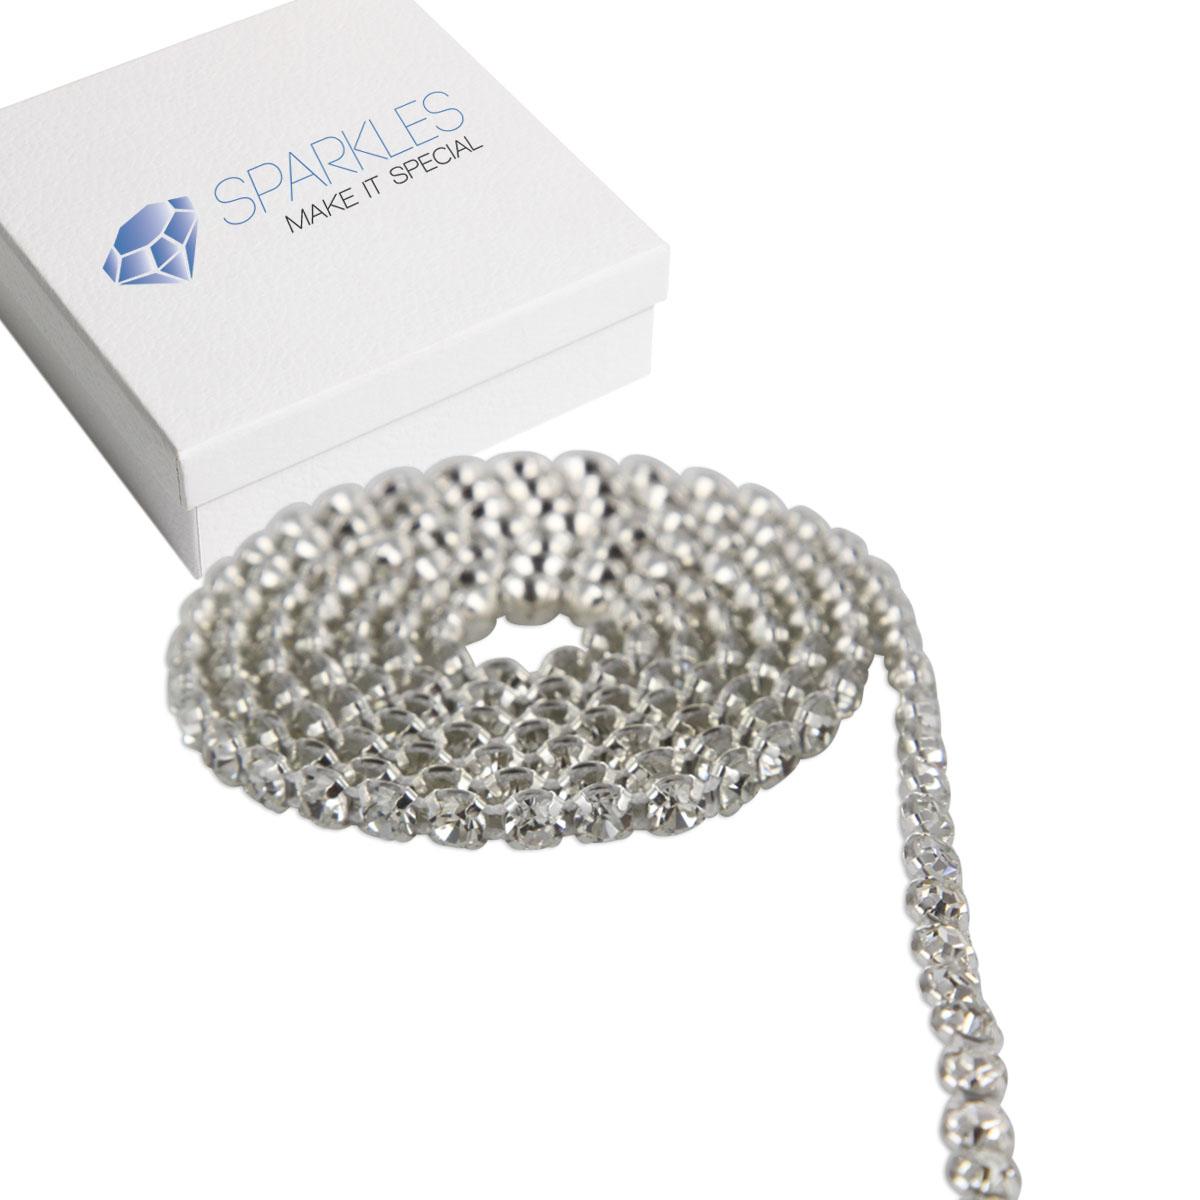 Rhinestone Bands: Premium SS19 SS16 Diamond Crystal Rhinestone Ribbon